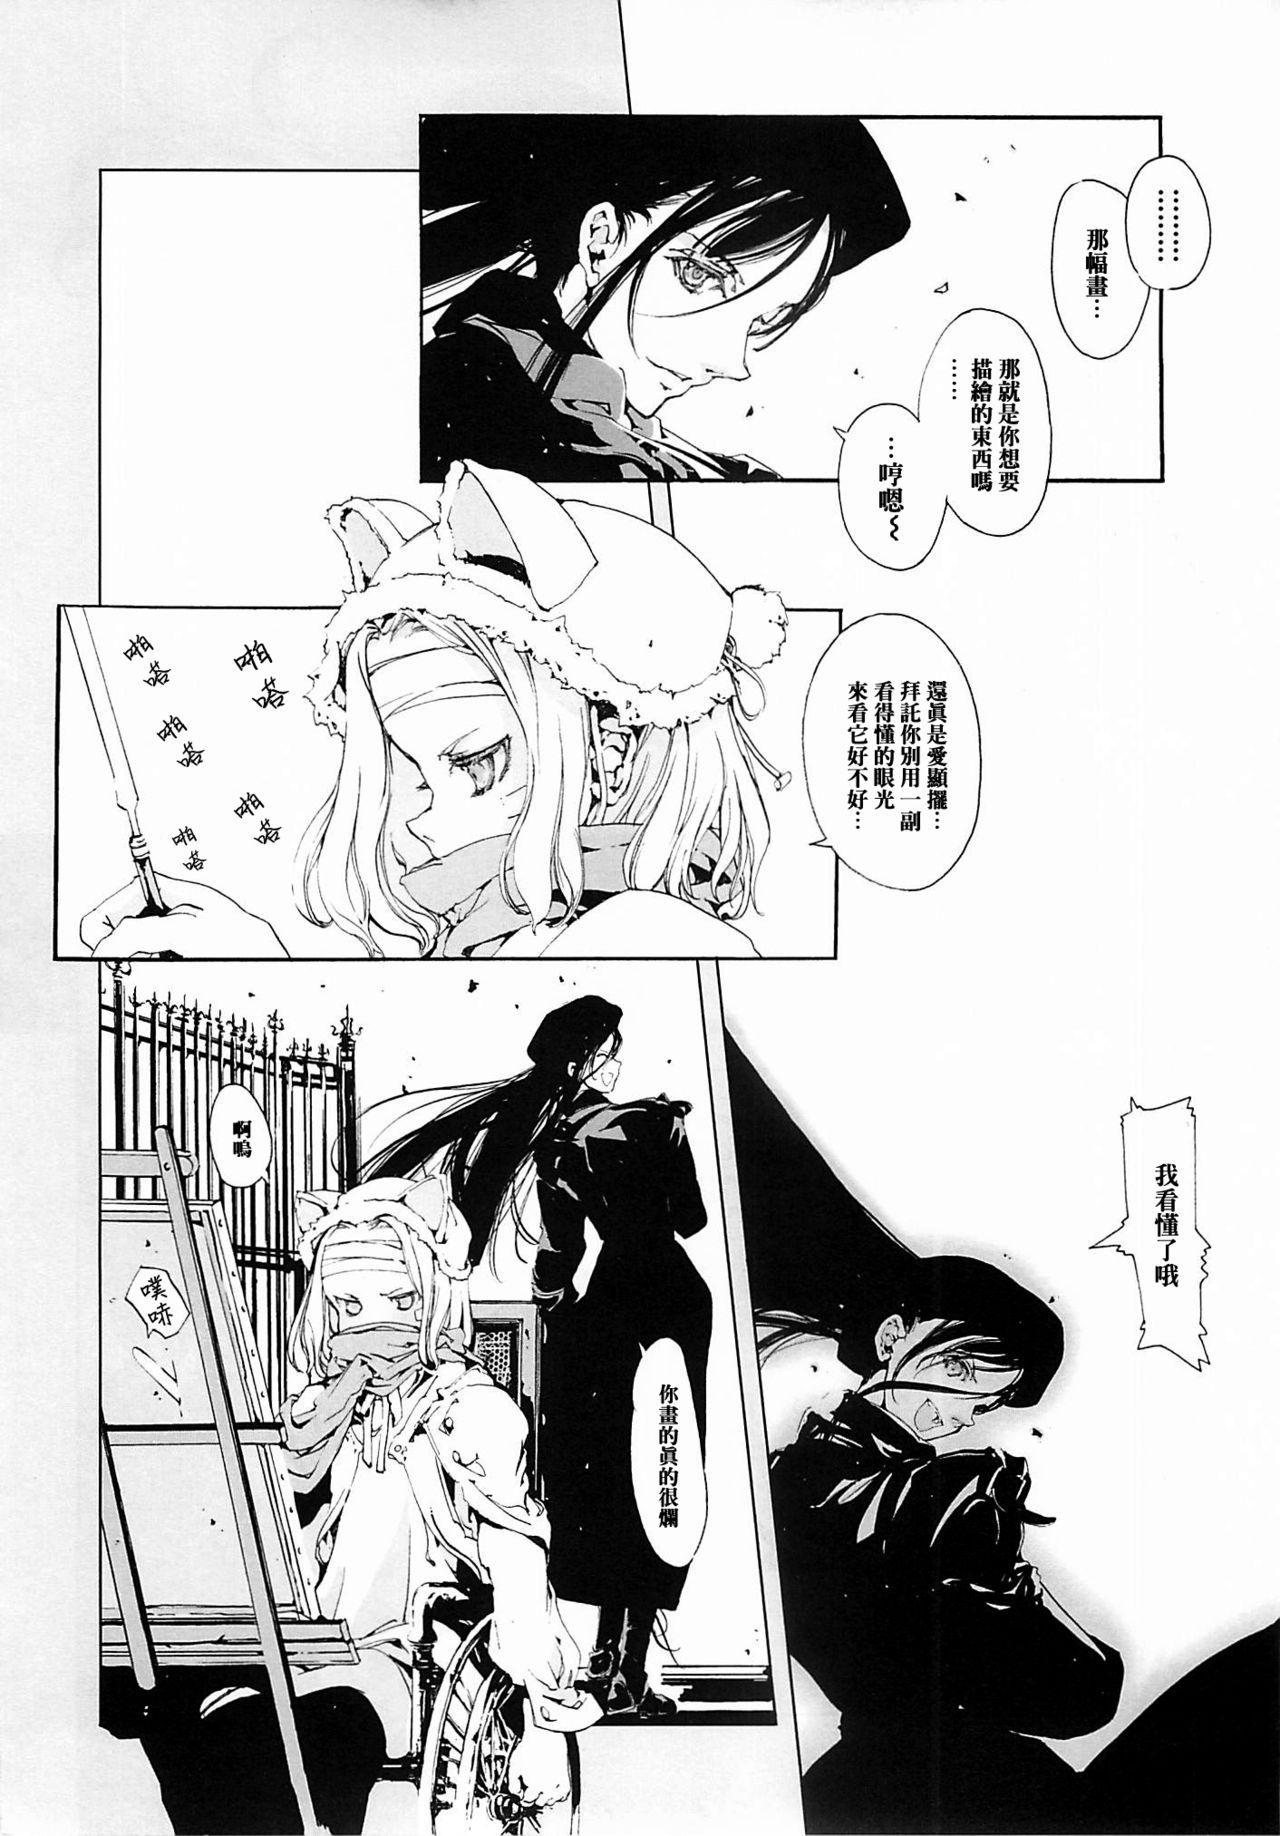 (CR37) [70 Nenshiki Yuukyuu Kikan (Endou Okito)] ORGAN-Tino  01-02[Chinese] [拾荒者汉化组] [Incomplete] 61